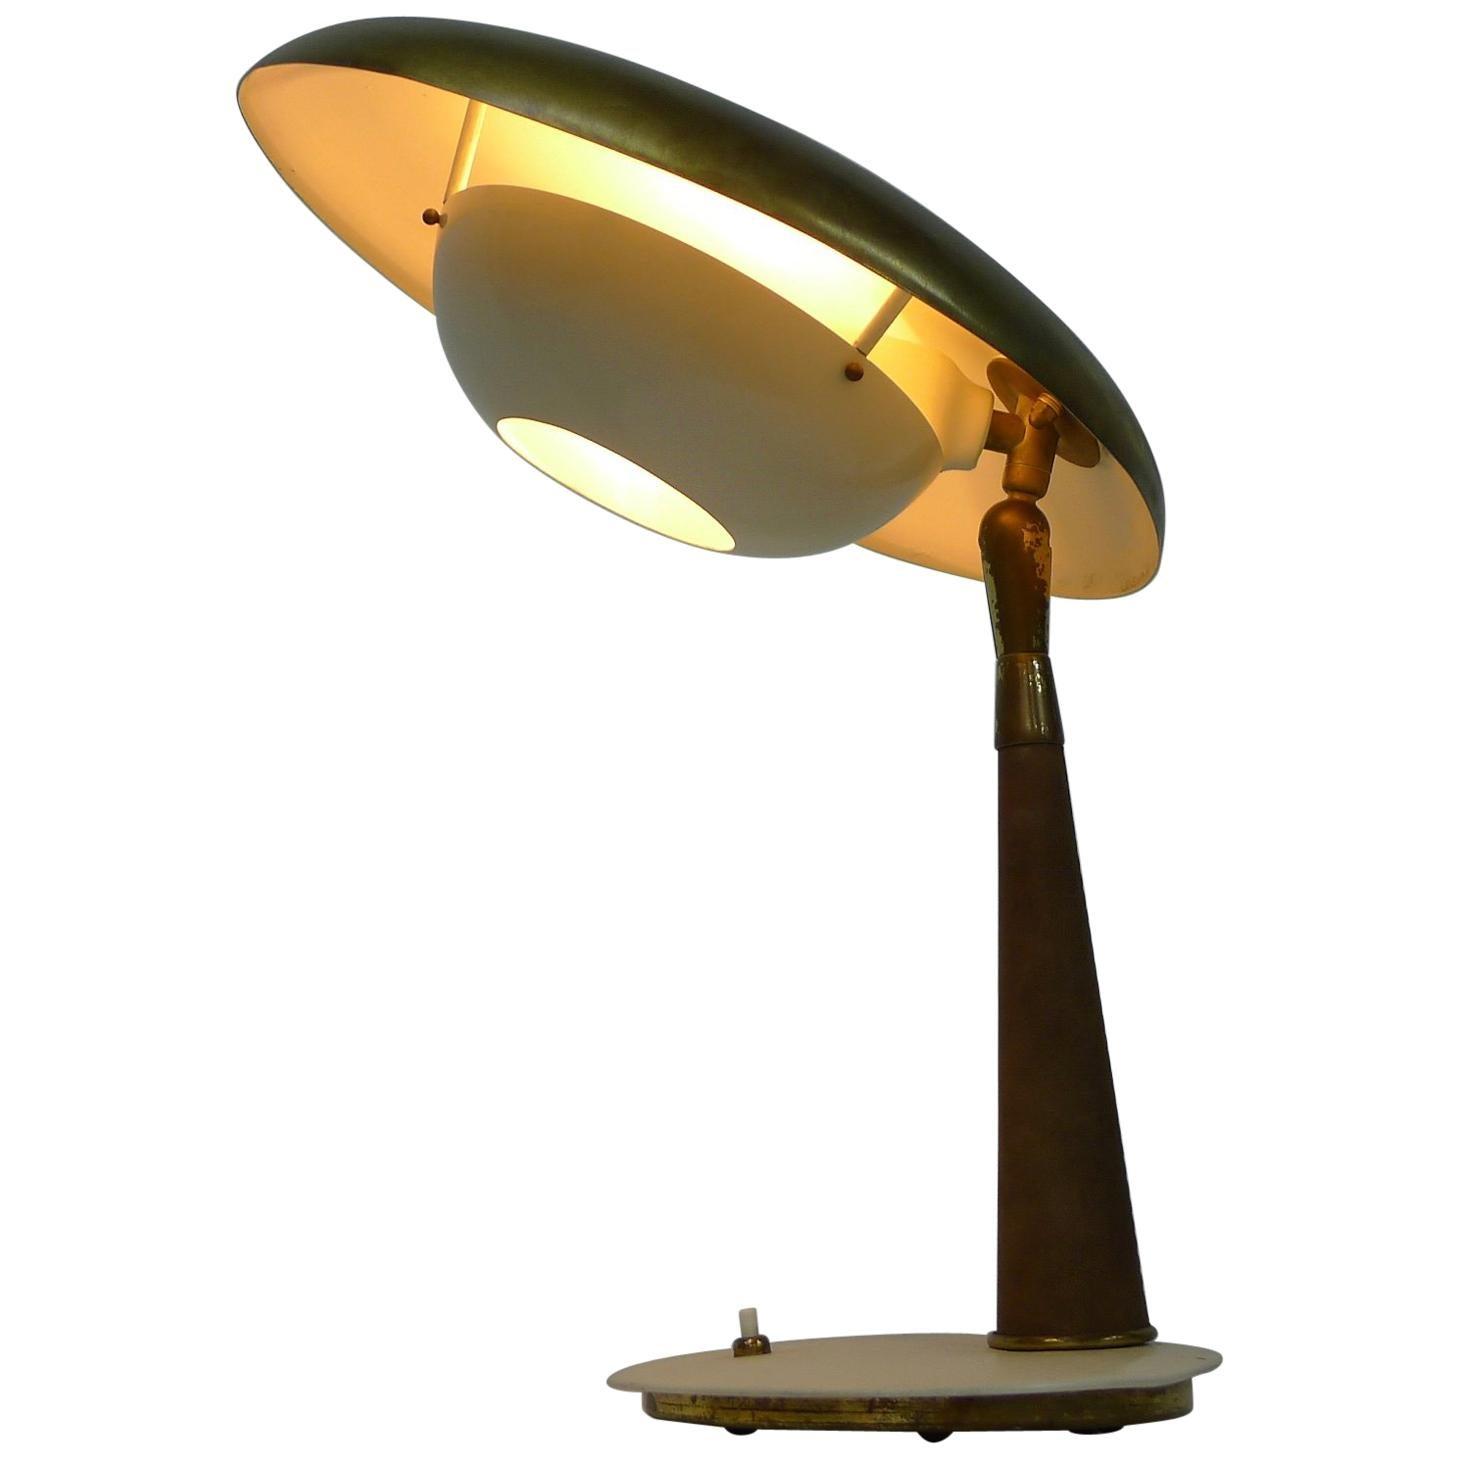 Arredoluce Table Lamp, Angelo Lelii, circa 1956